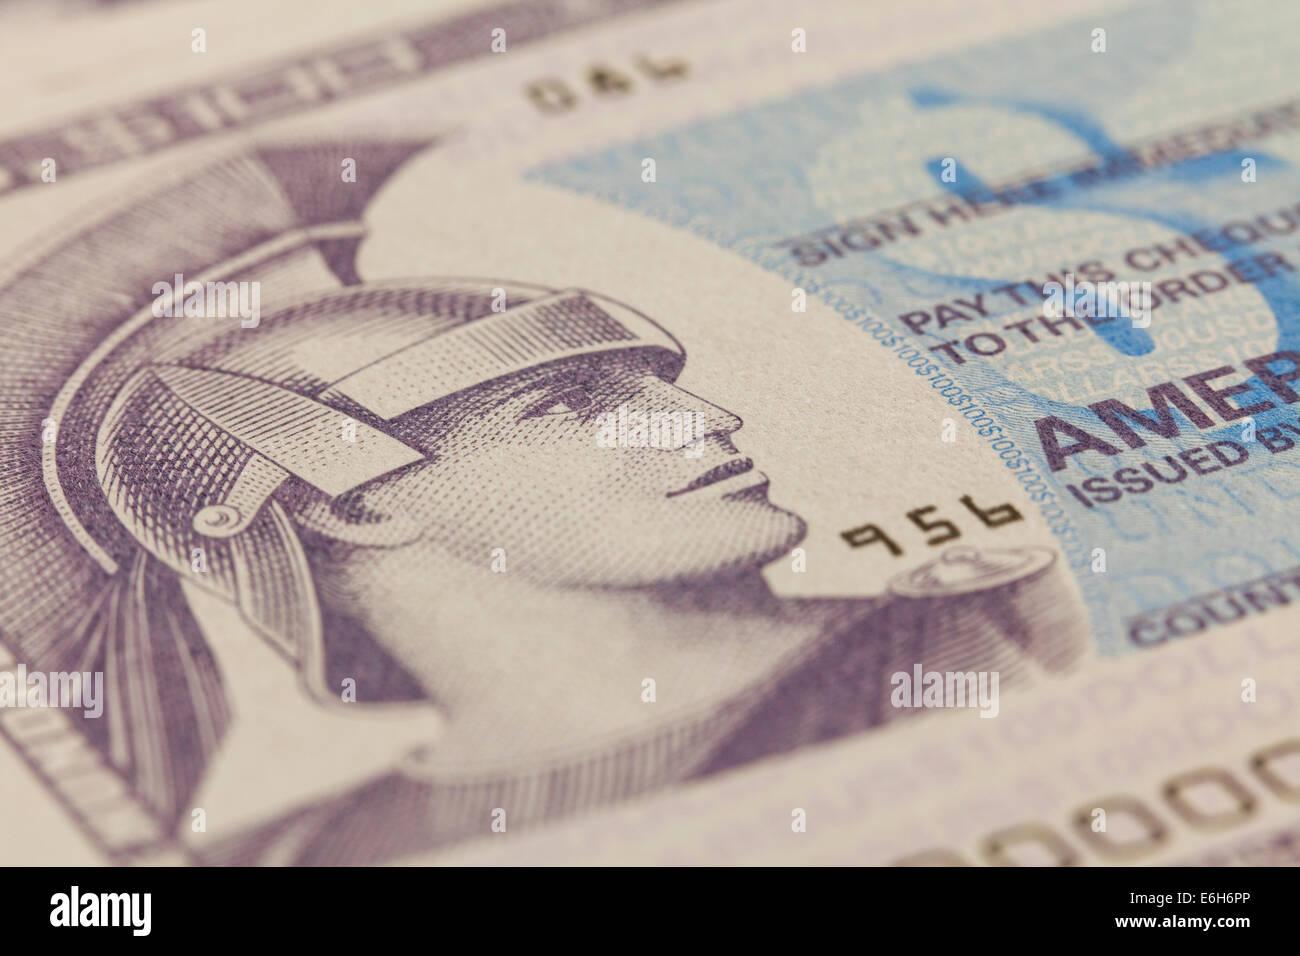 American Express travelers checque closeup - Stock Image